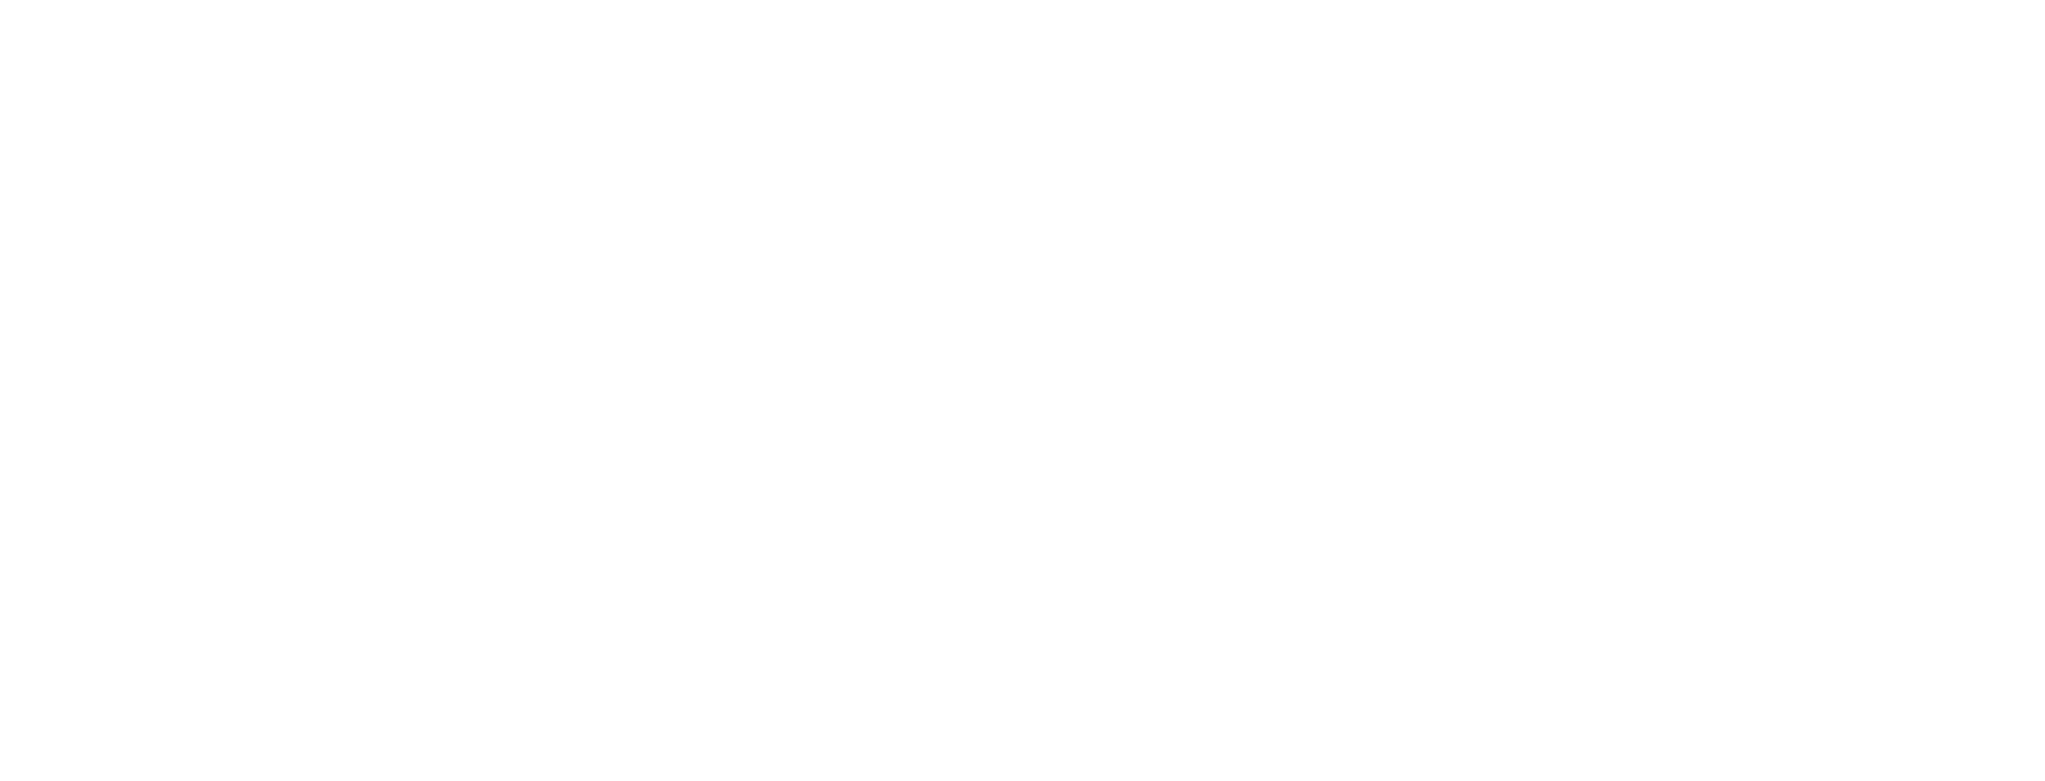 Limits-bianco-No-Background